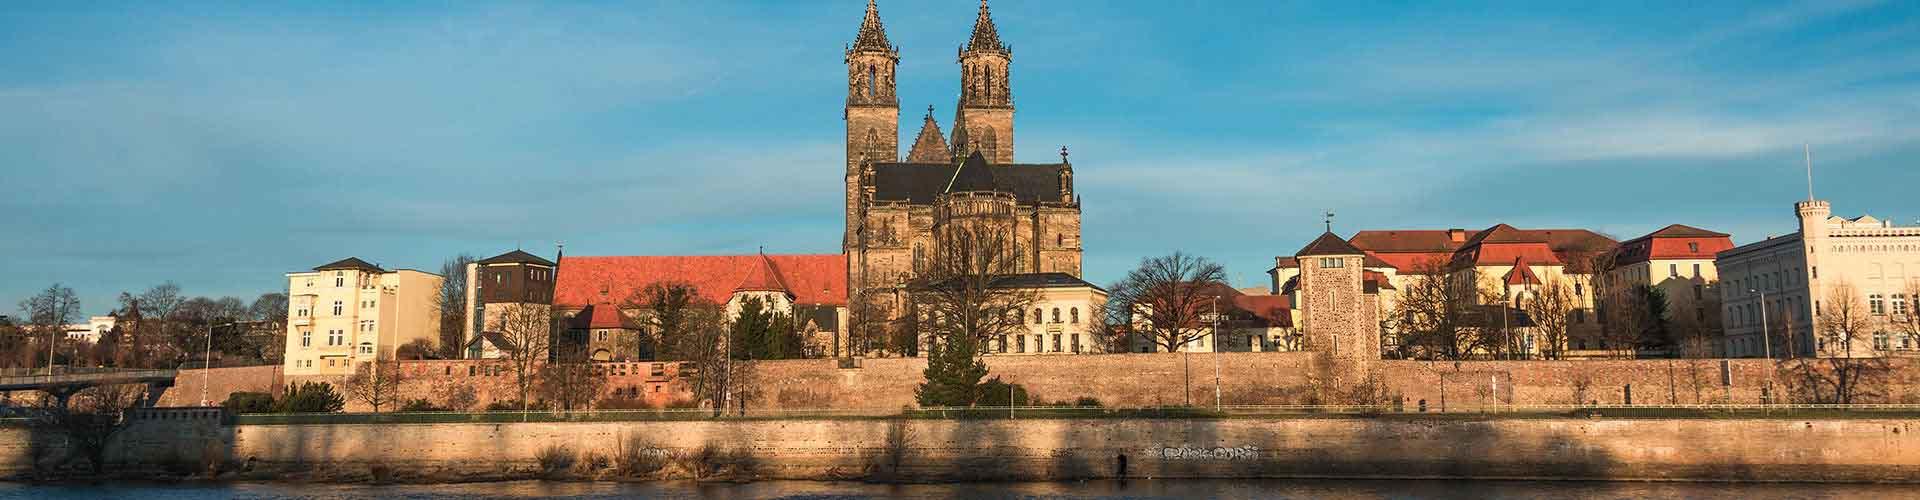 Magdeburgo - Apartamentos en Magdeburgo. Mapas de Magdeburgo, Fotos y comentarios de cada Apartamento en Magdeburgo.